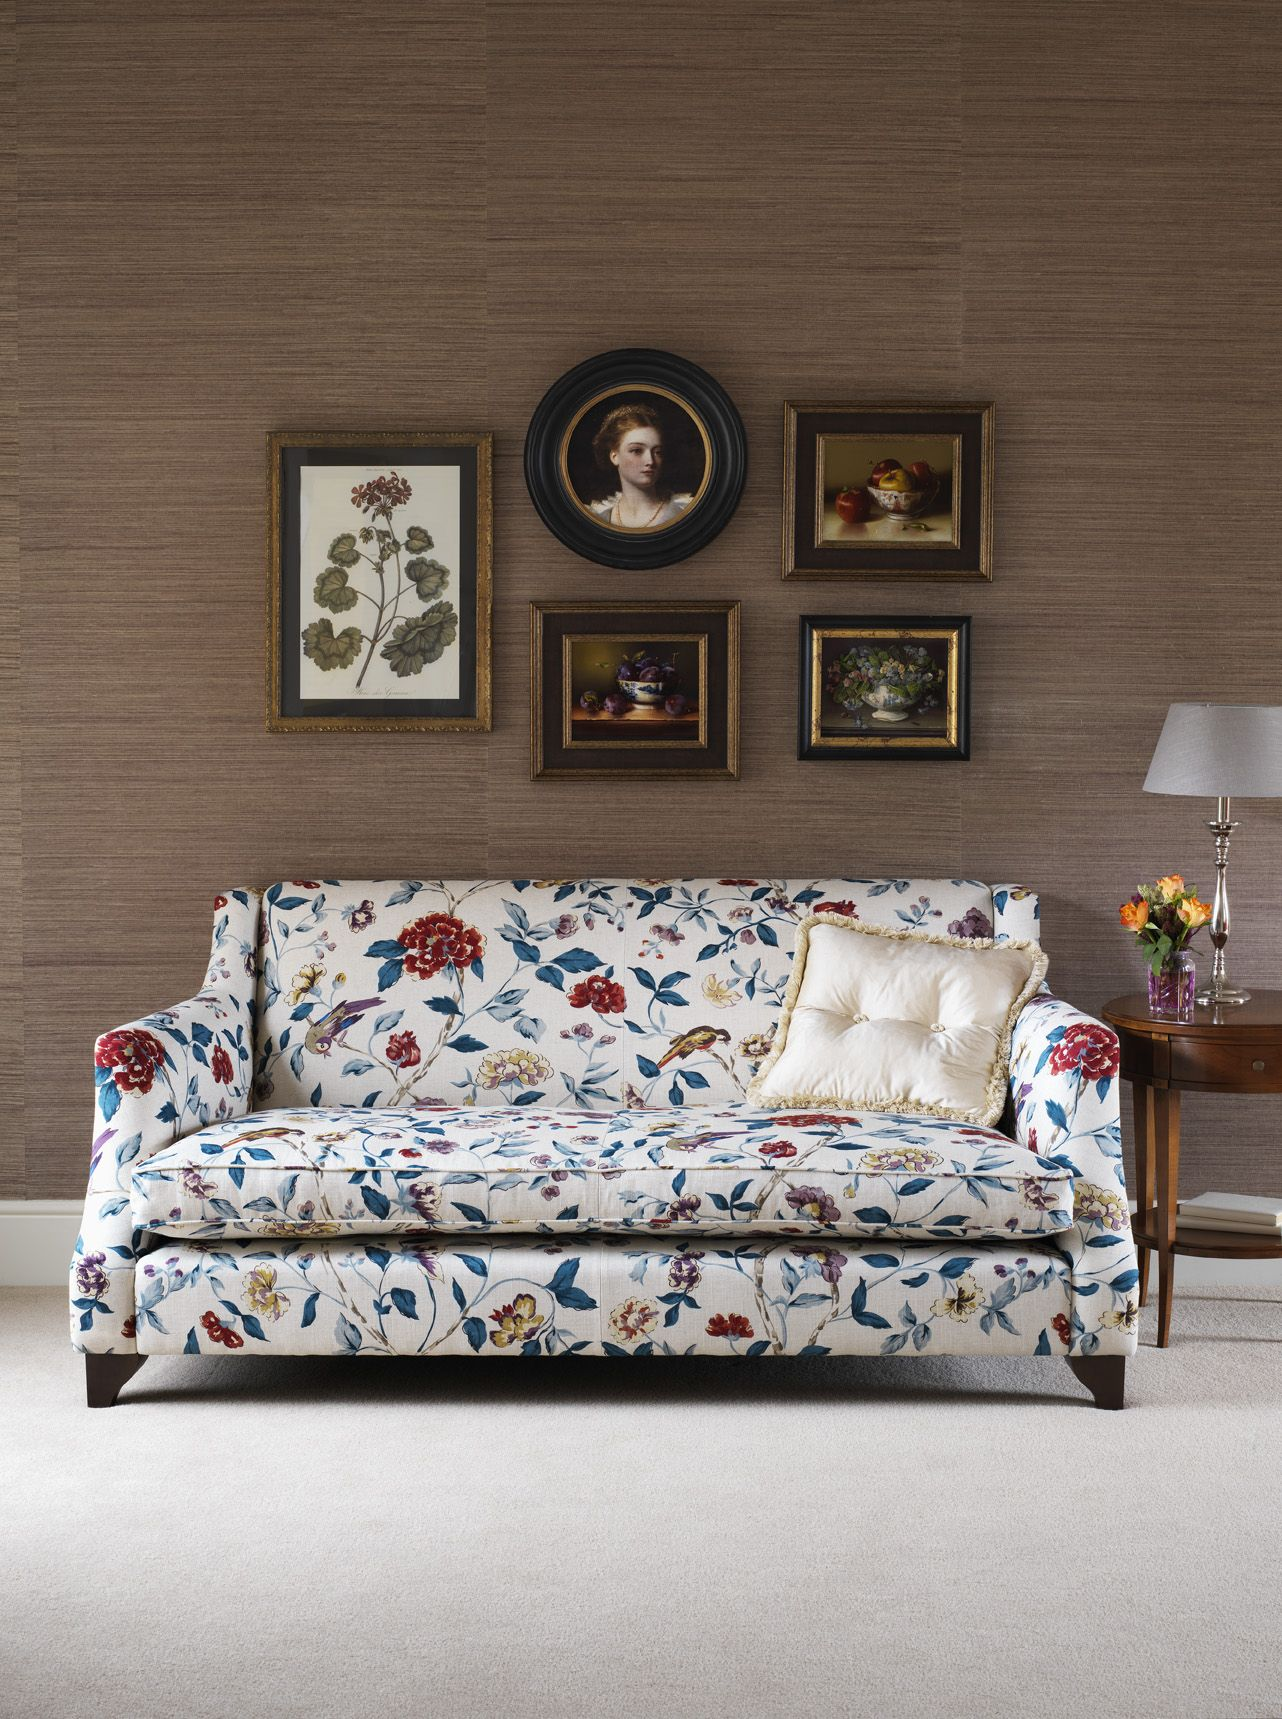 Enslow plain back sofa in Sanderson Sissinghurst WesleyBarrell